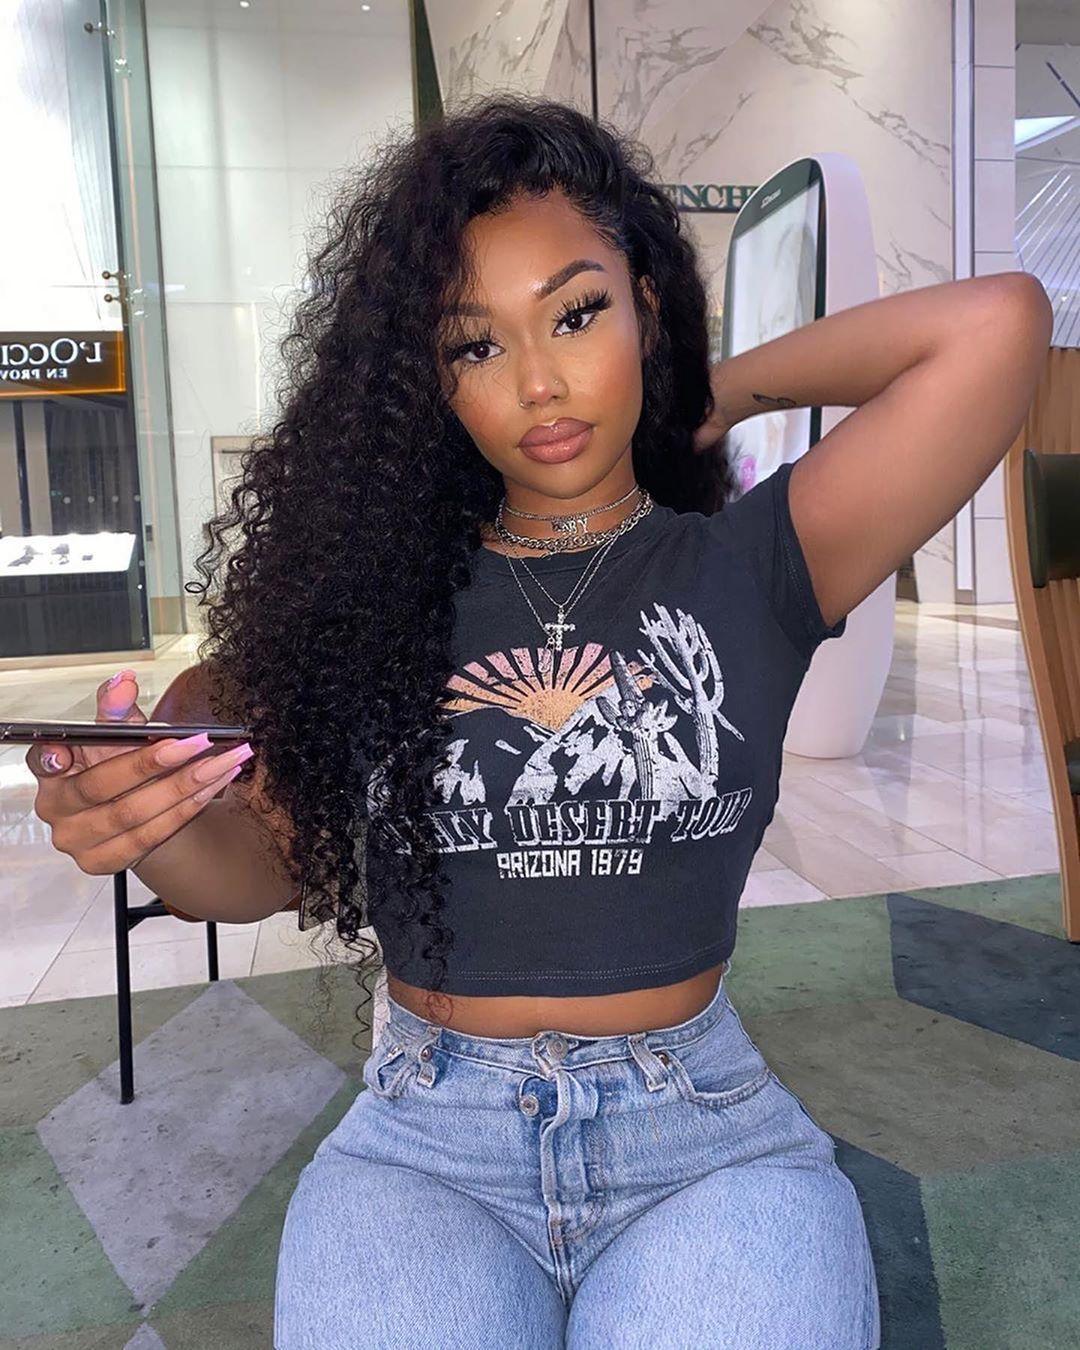 Black Girls Killing It Be: Pin On Black Girls Killing It